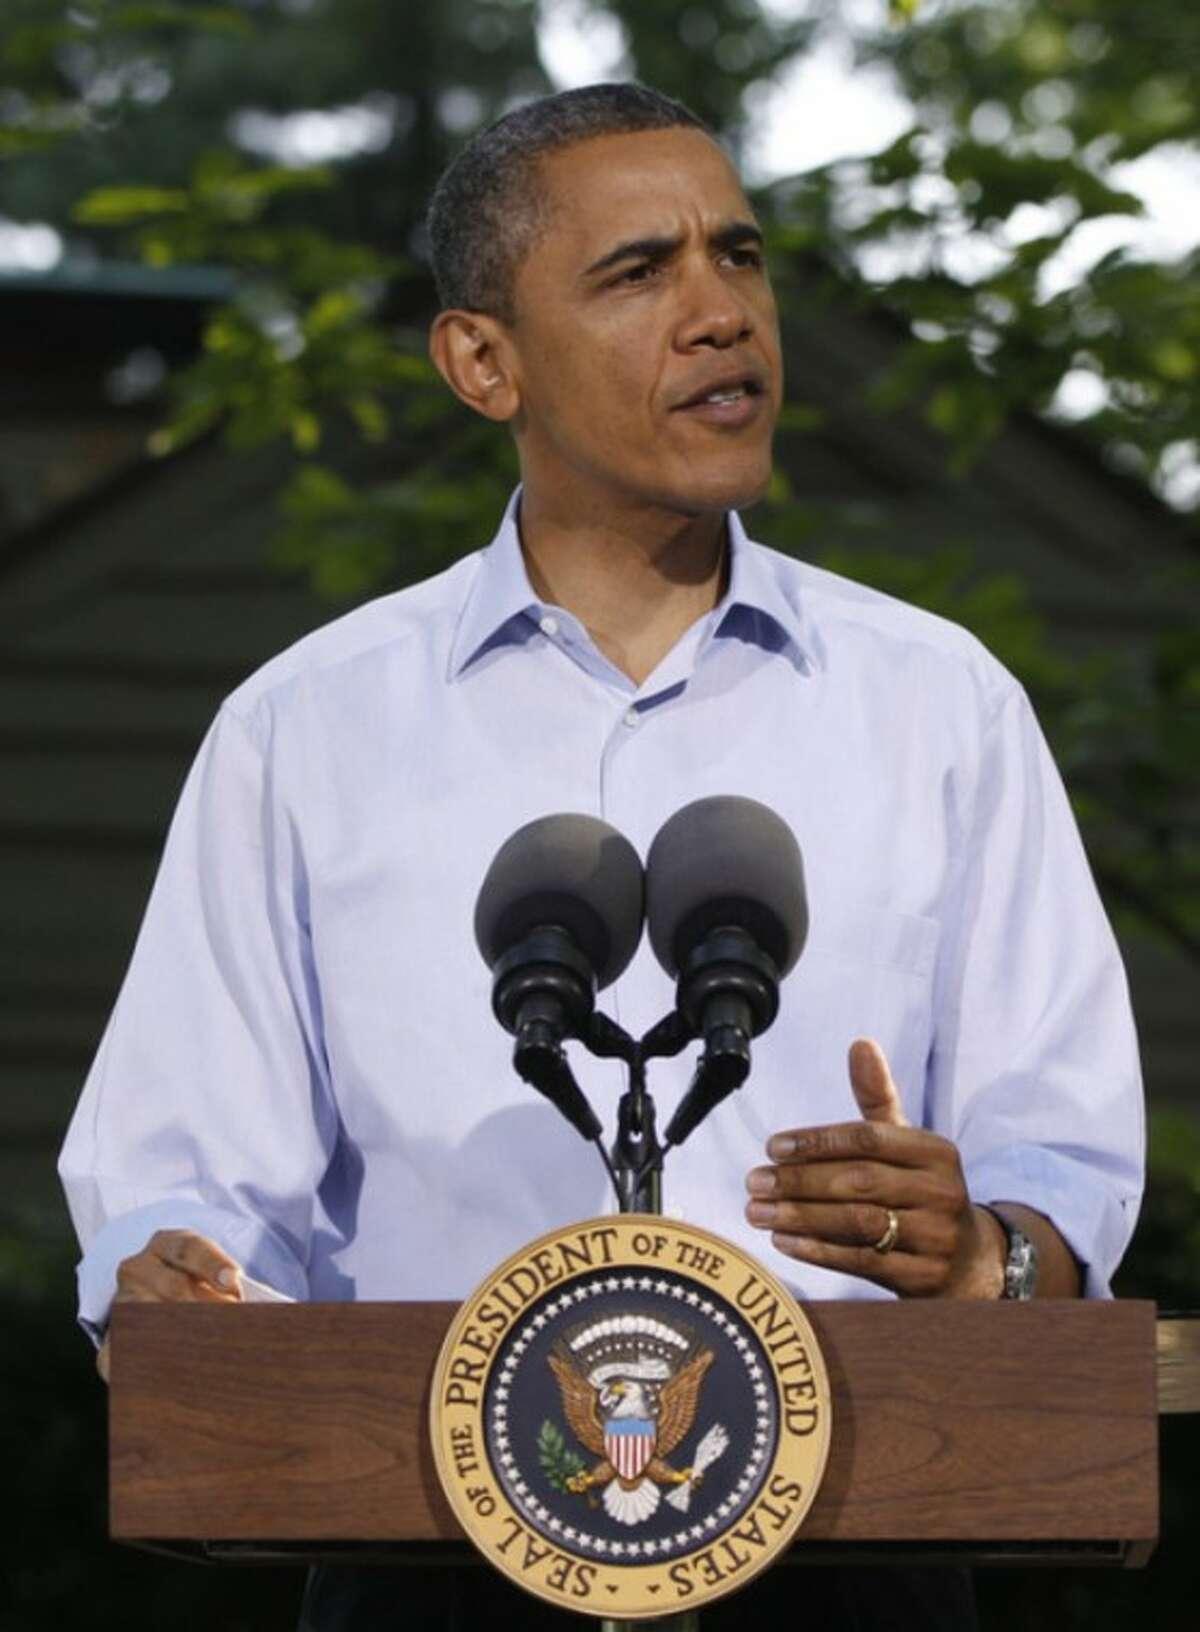 President Barack Obama briefs journalists following the G-8 Summit Saturday, May 19, 2012 at Camp David, Md. (AP Photo/Charles Dharapak)